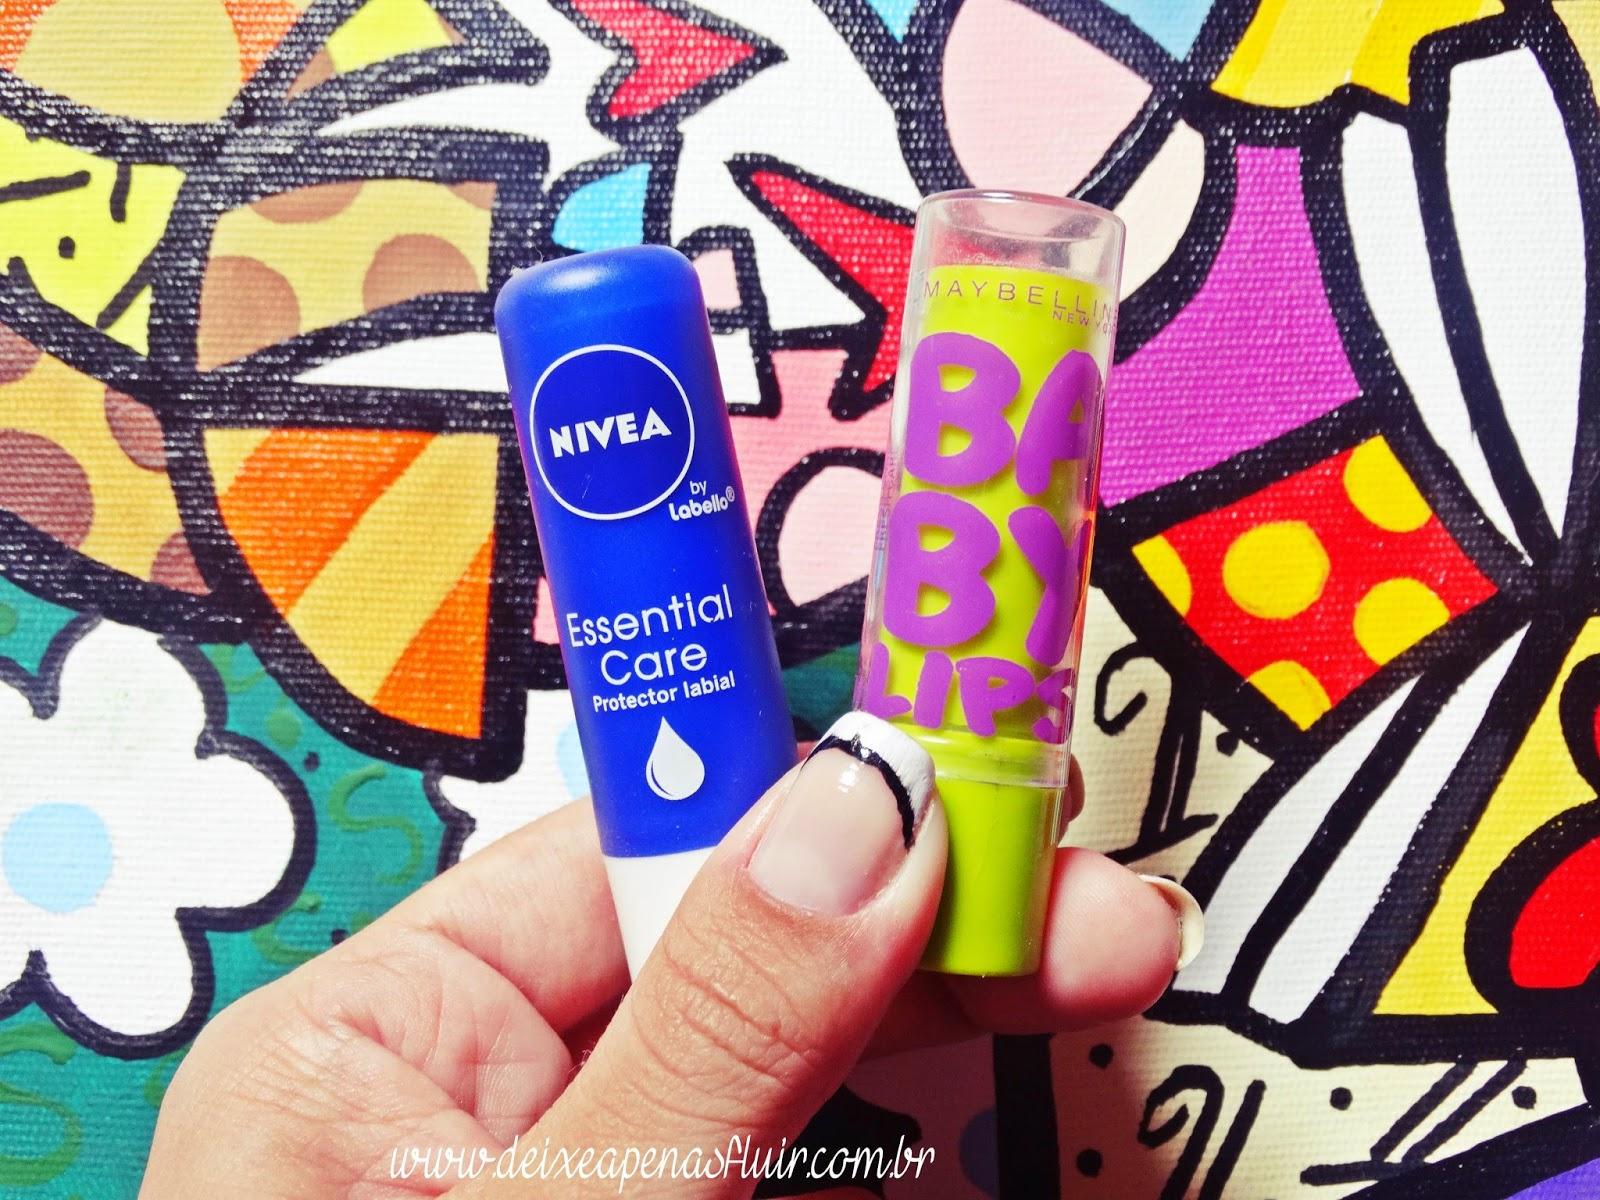 DSC02153 - Batalha dos Lip Balms: Nivea vs Maybelline